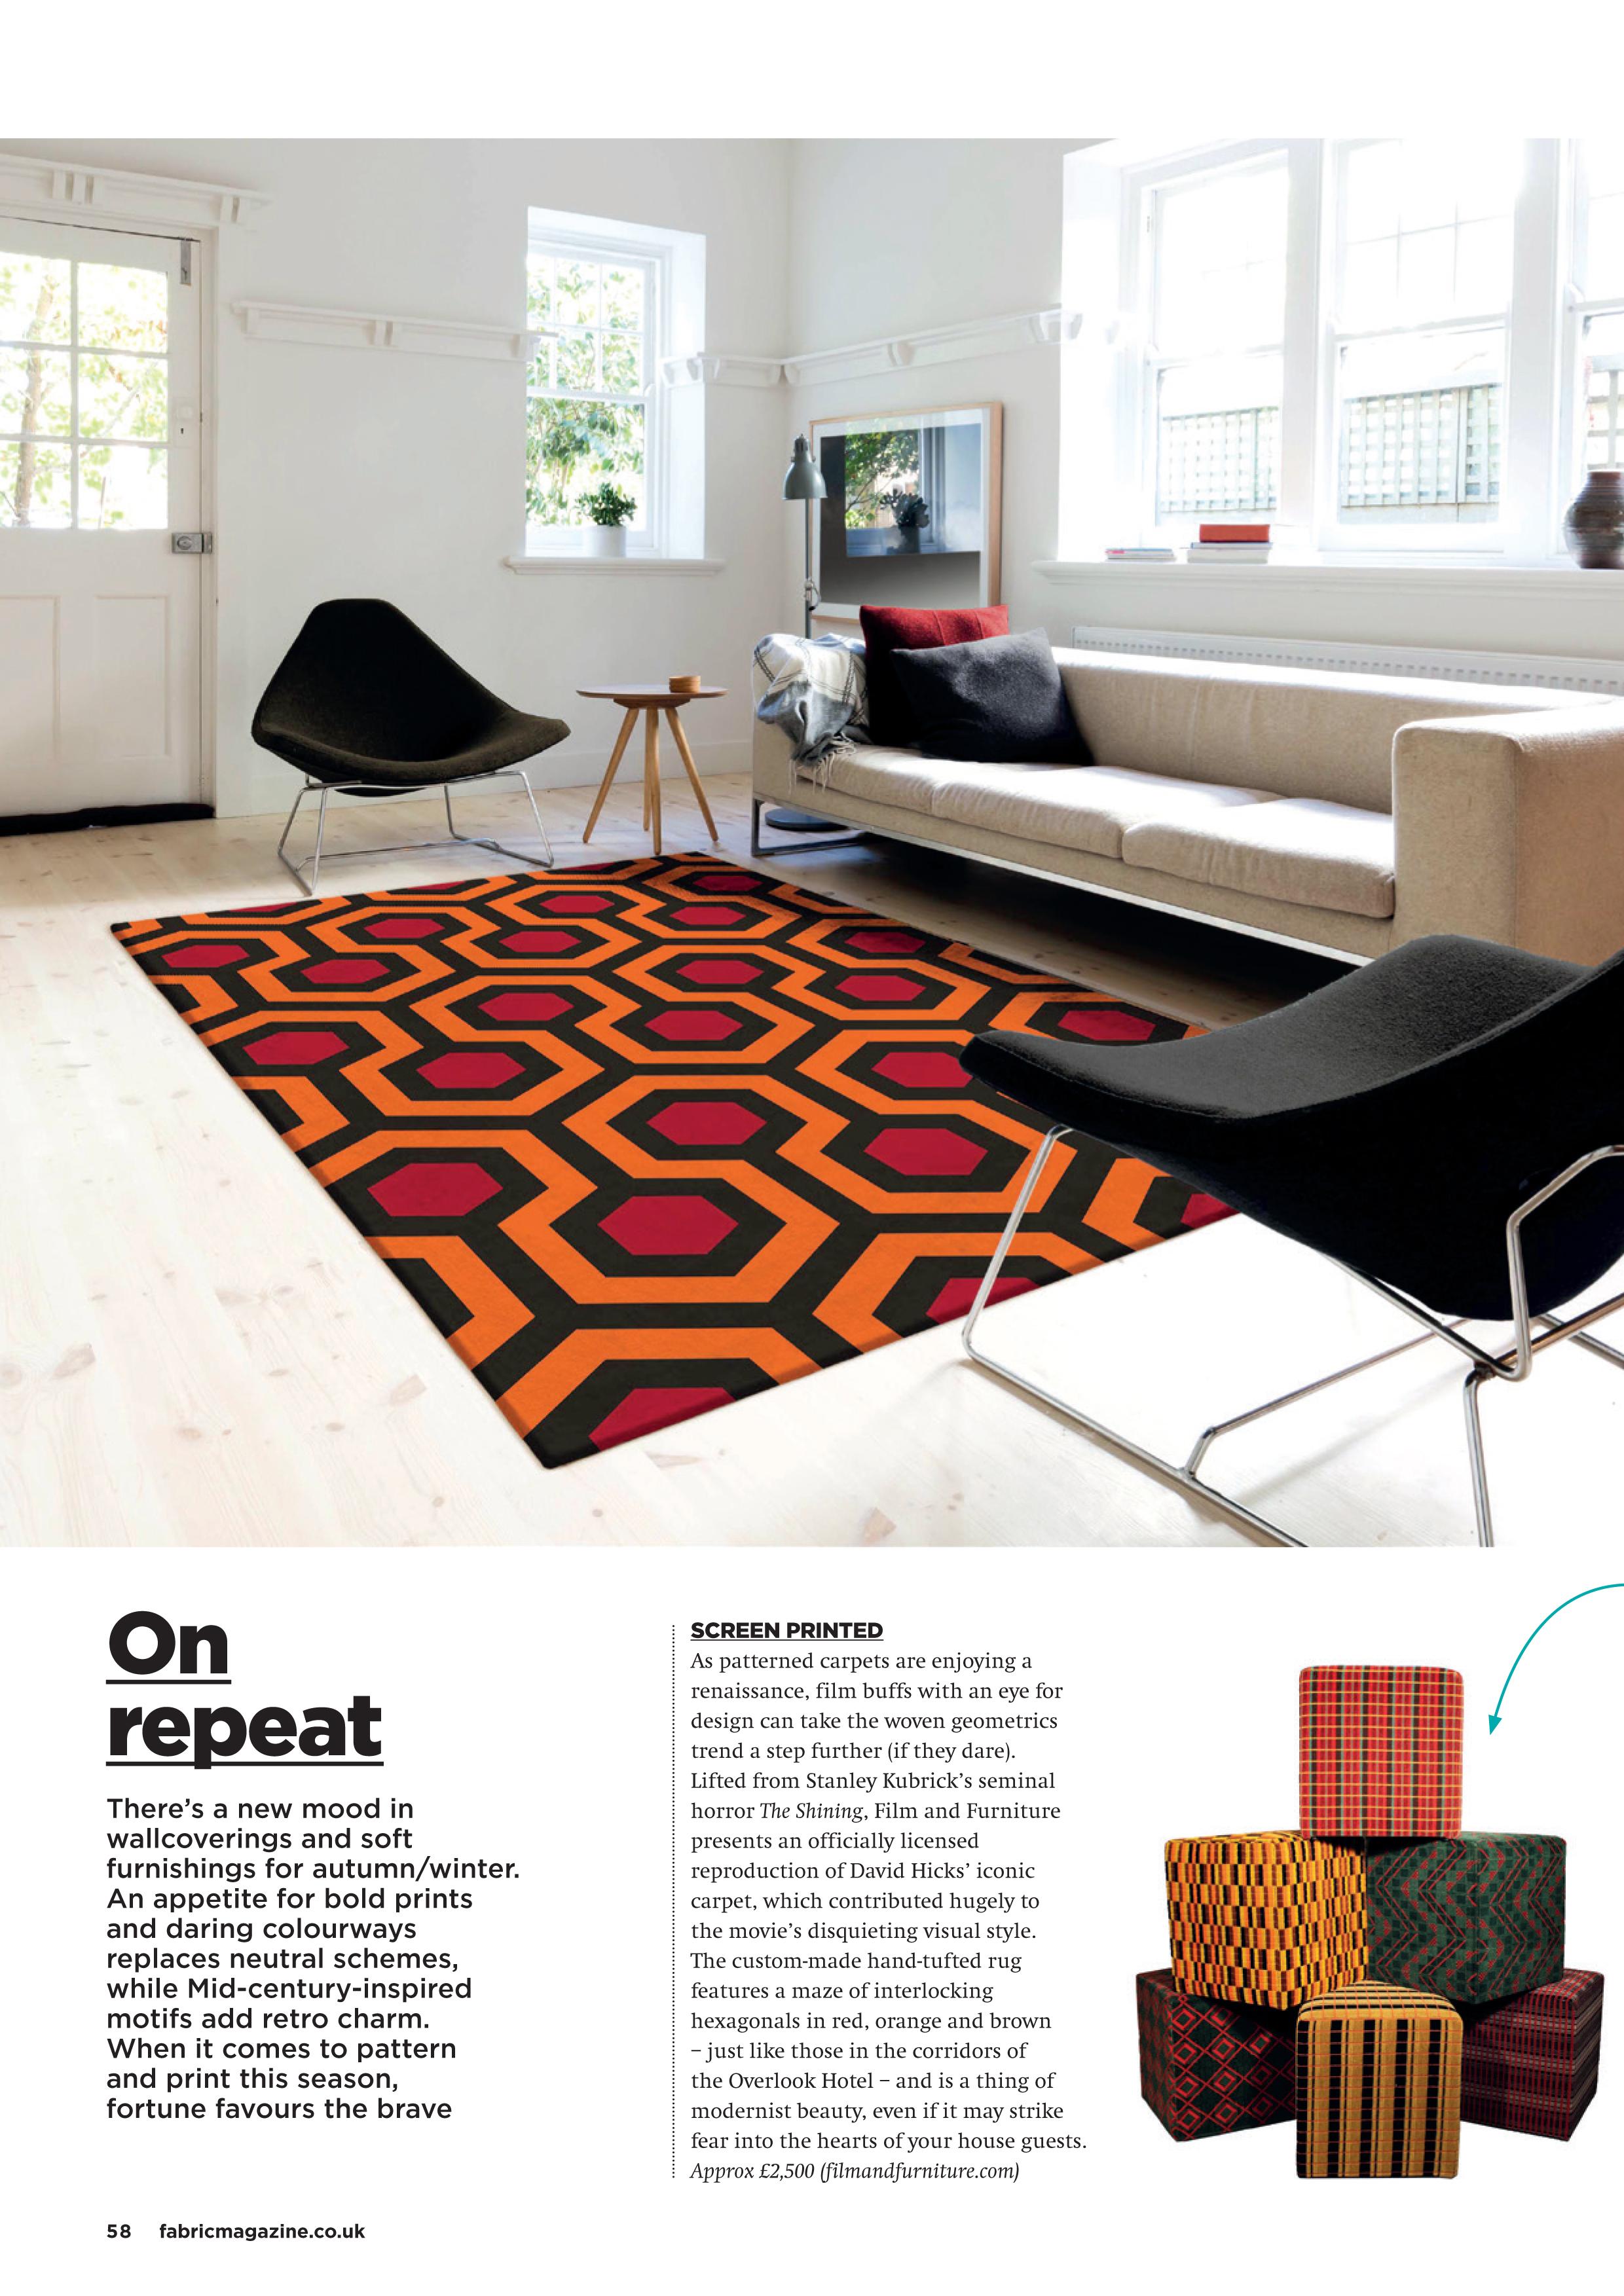 fabric magazine spread the shining carpet